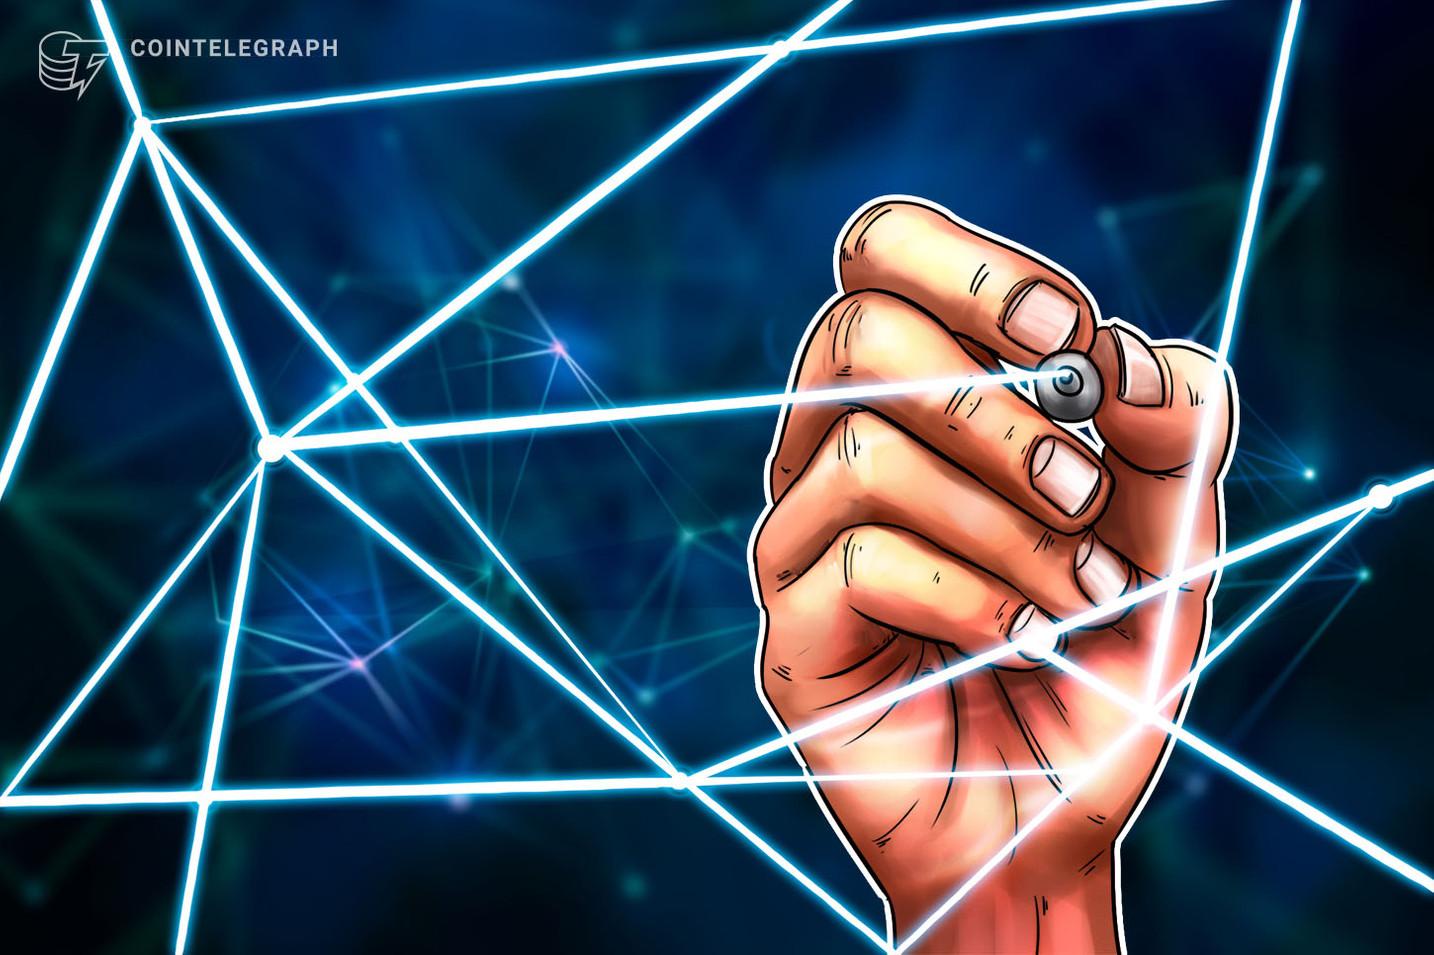 World's Top Customer Relations Platform Integrates Commercial Blockchain